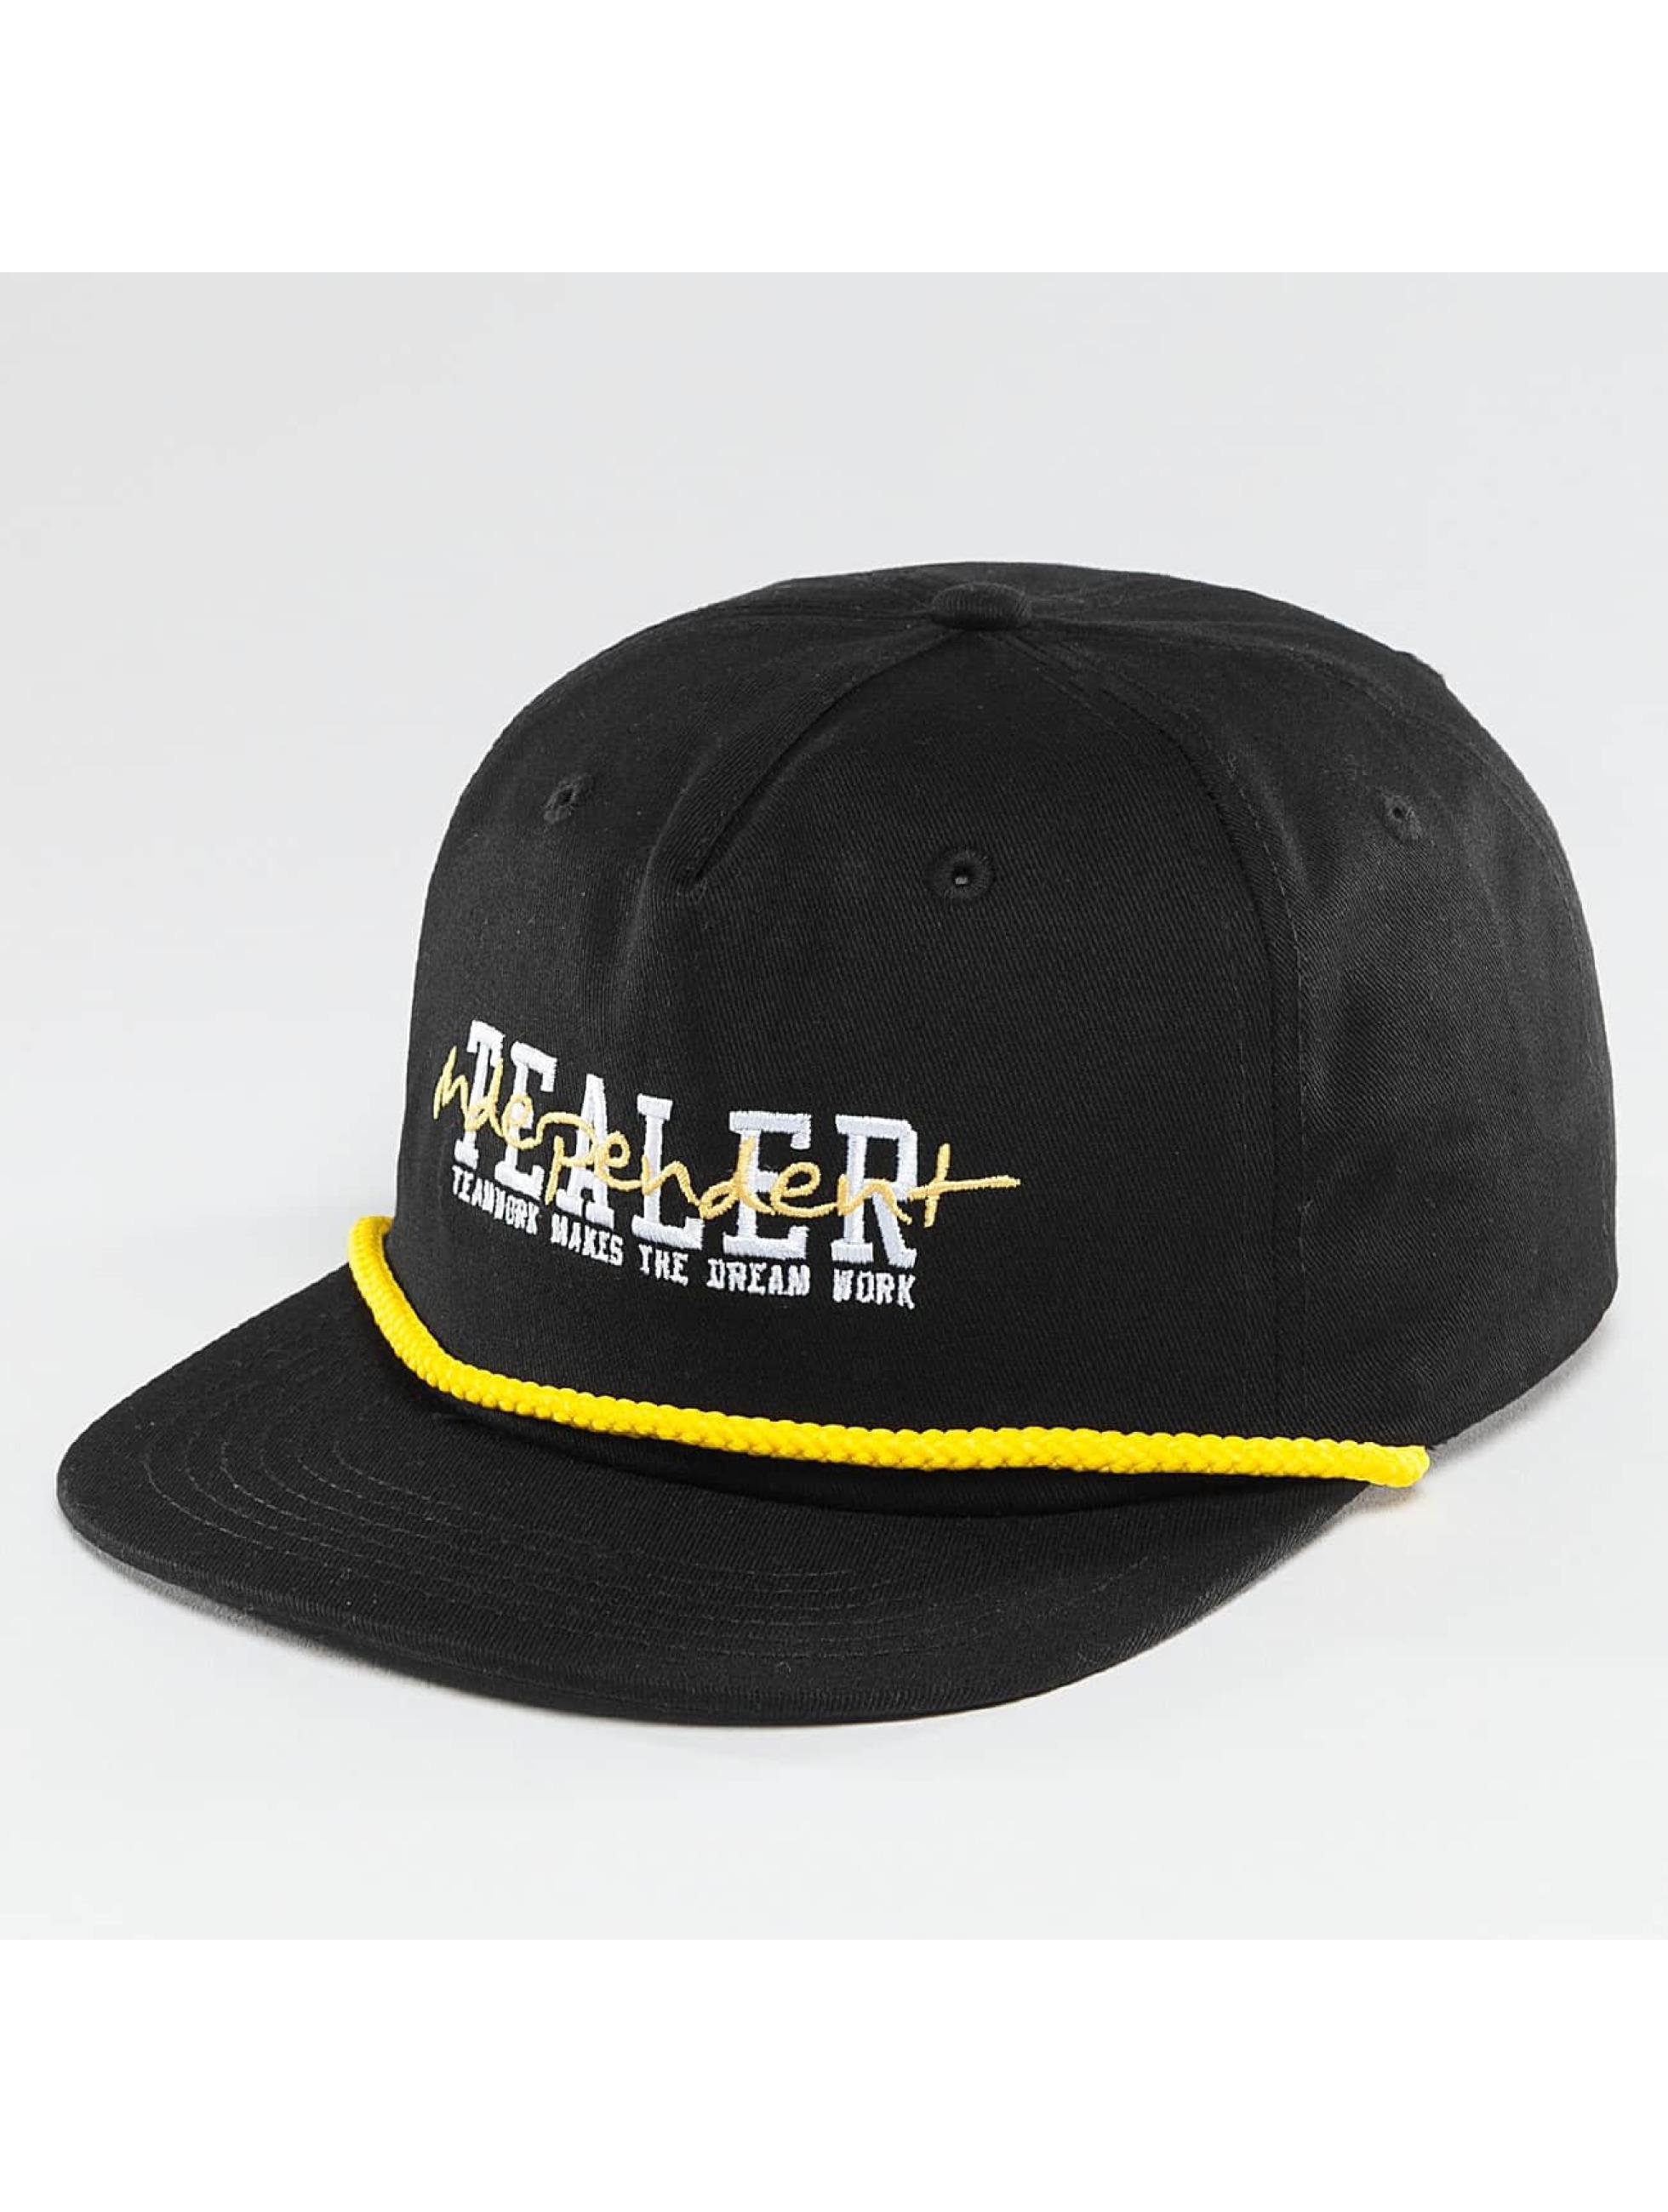 Tealer 5 Panel Caps Independent czarny